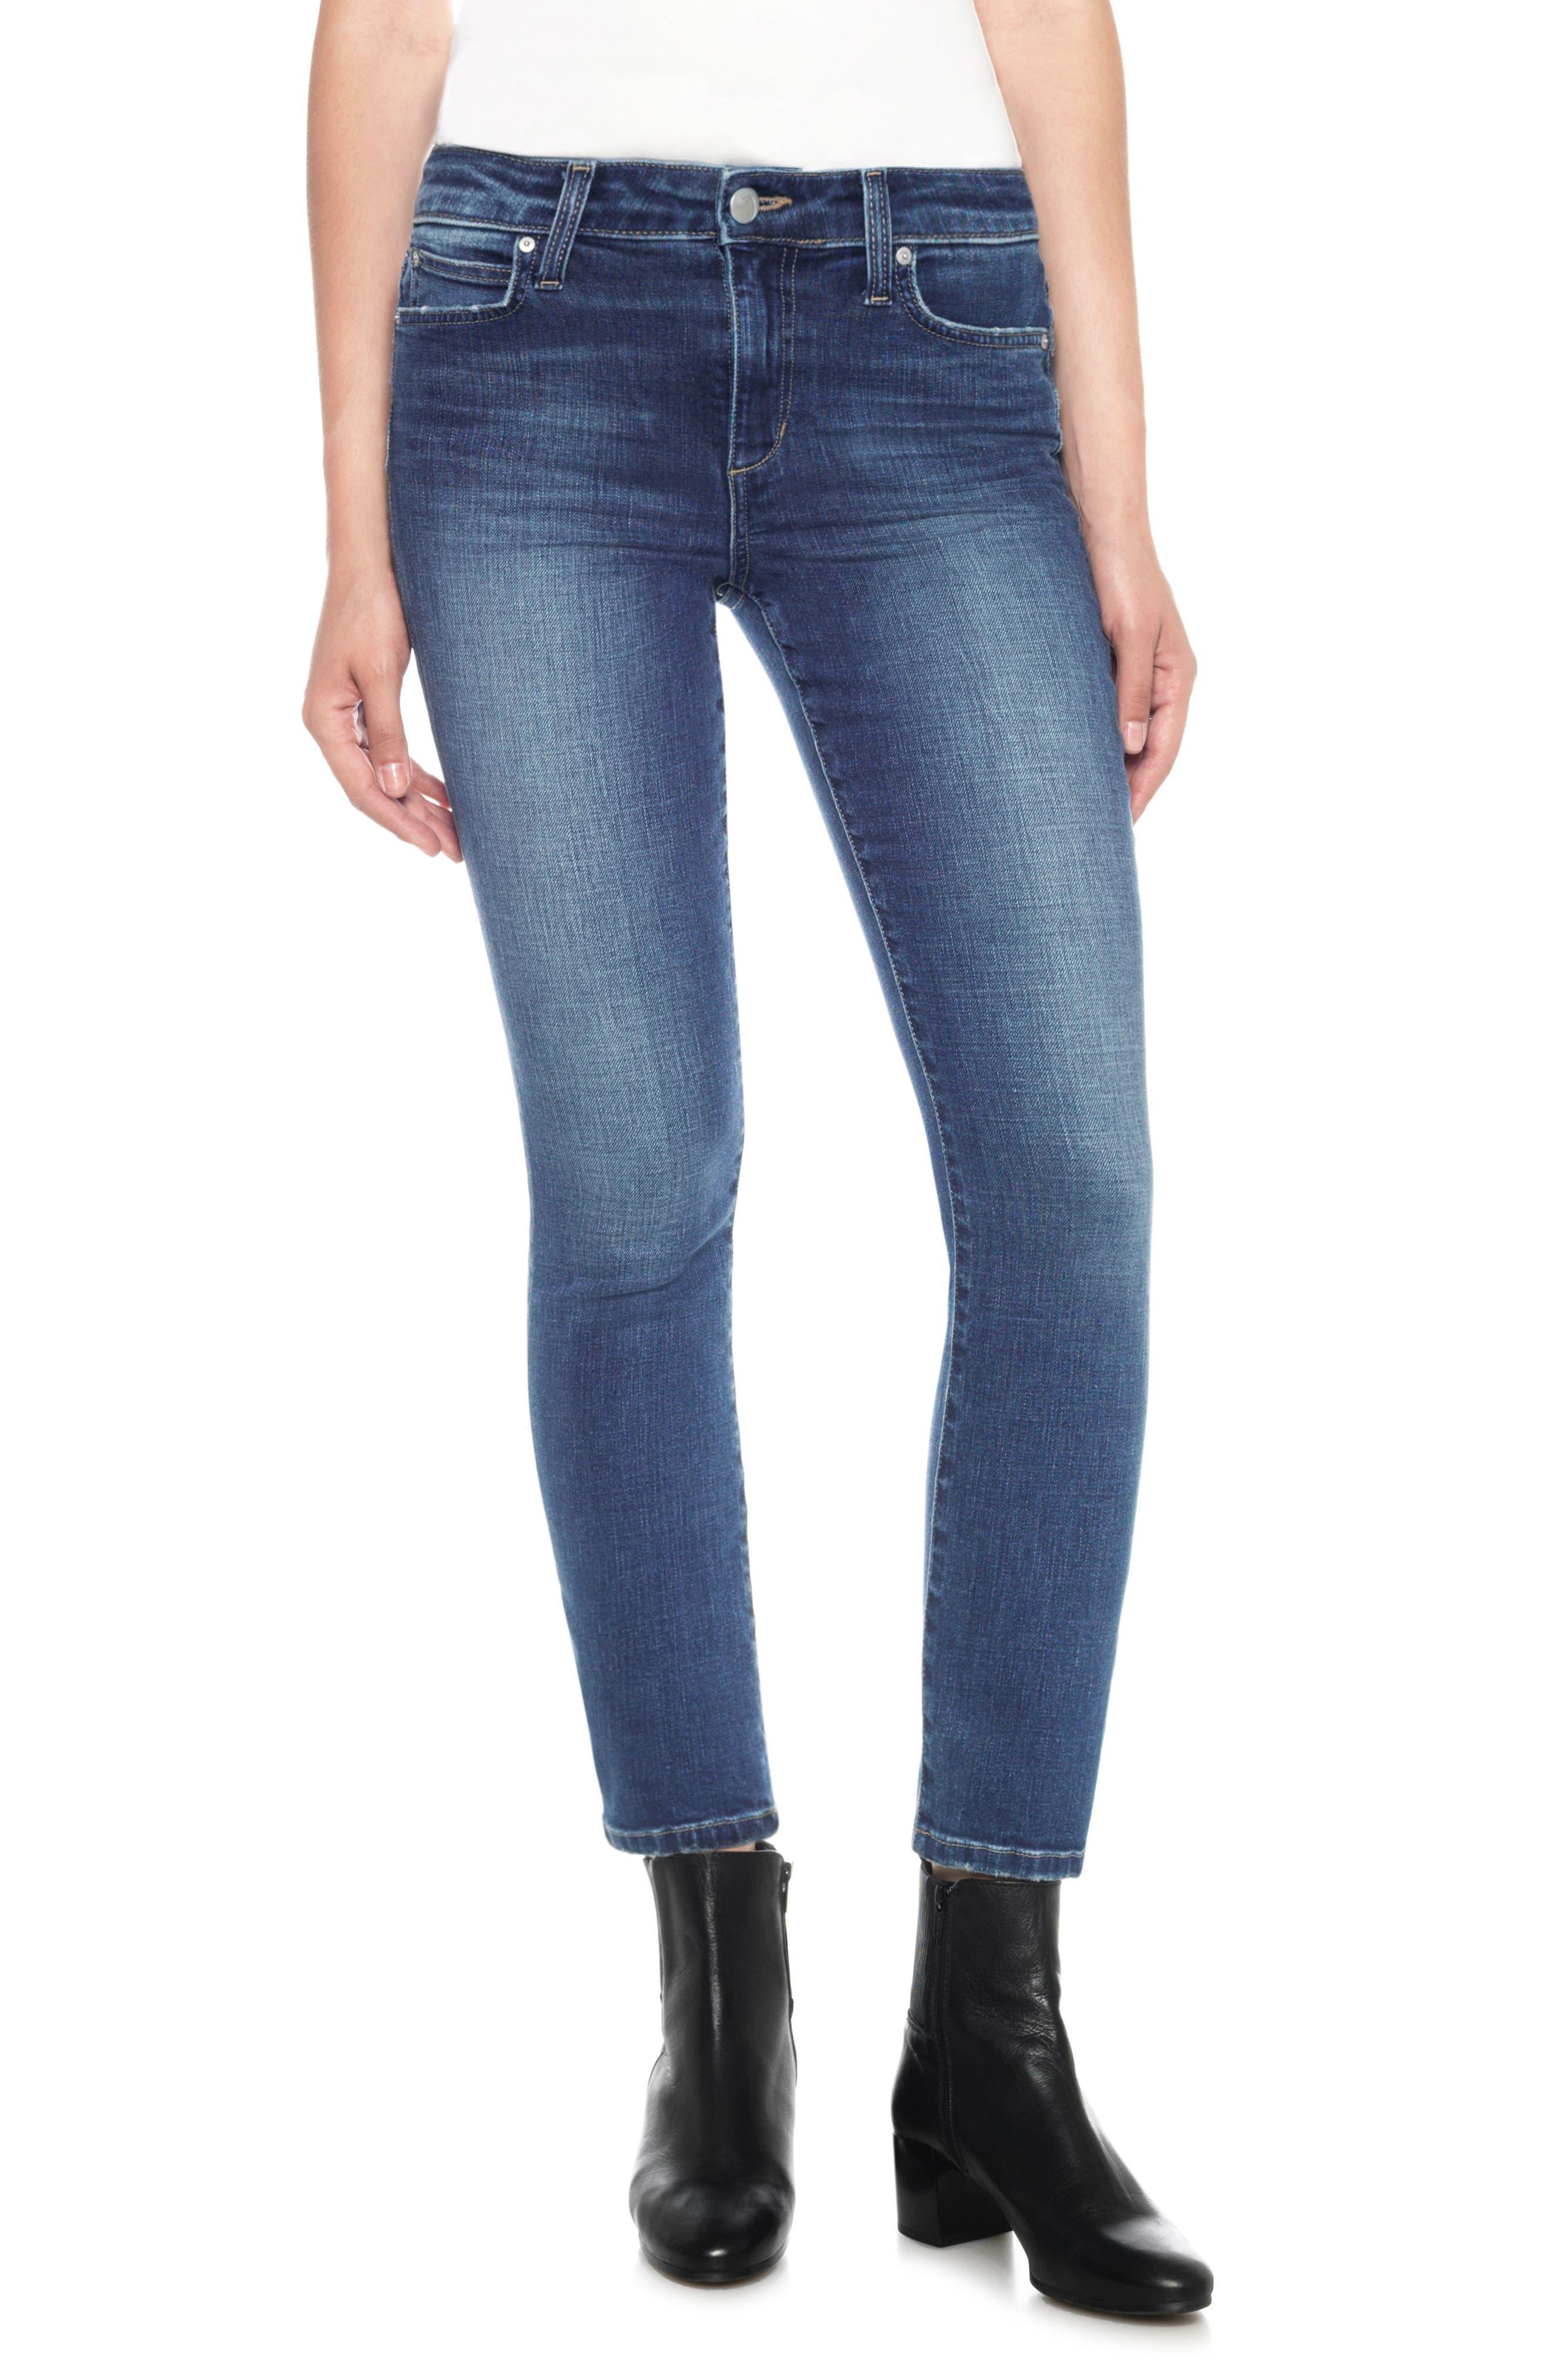 Kass Ankle Straight Leg Jeans,                             Main thumbnail 1, color,                             Sutton